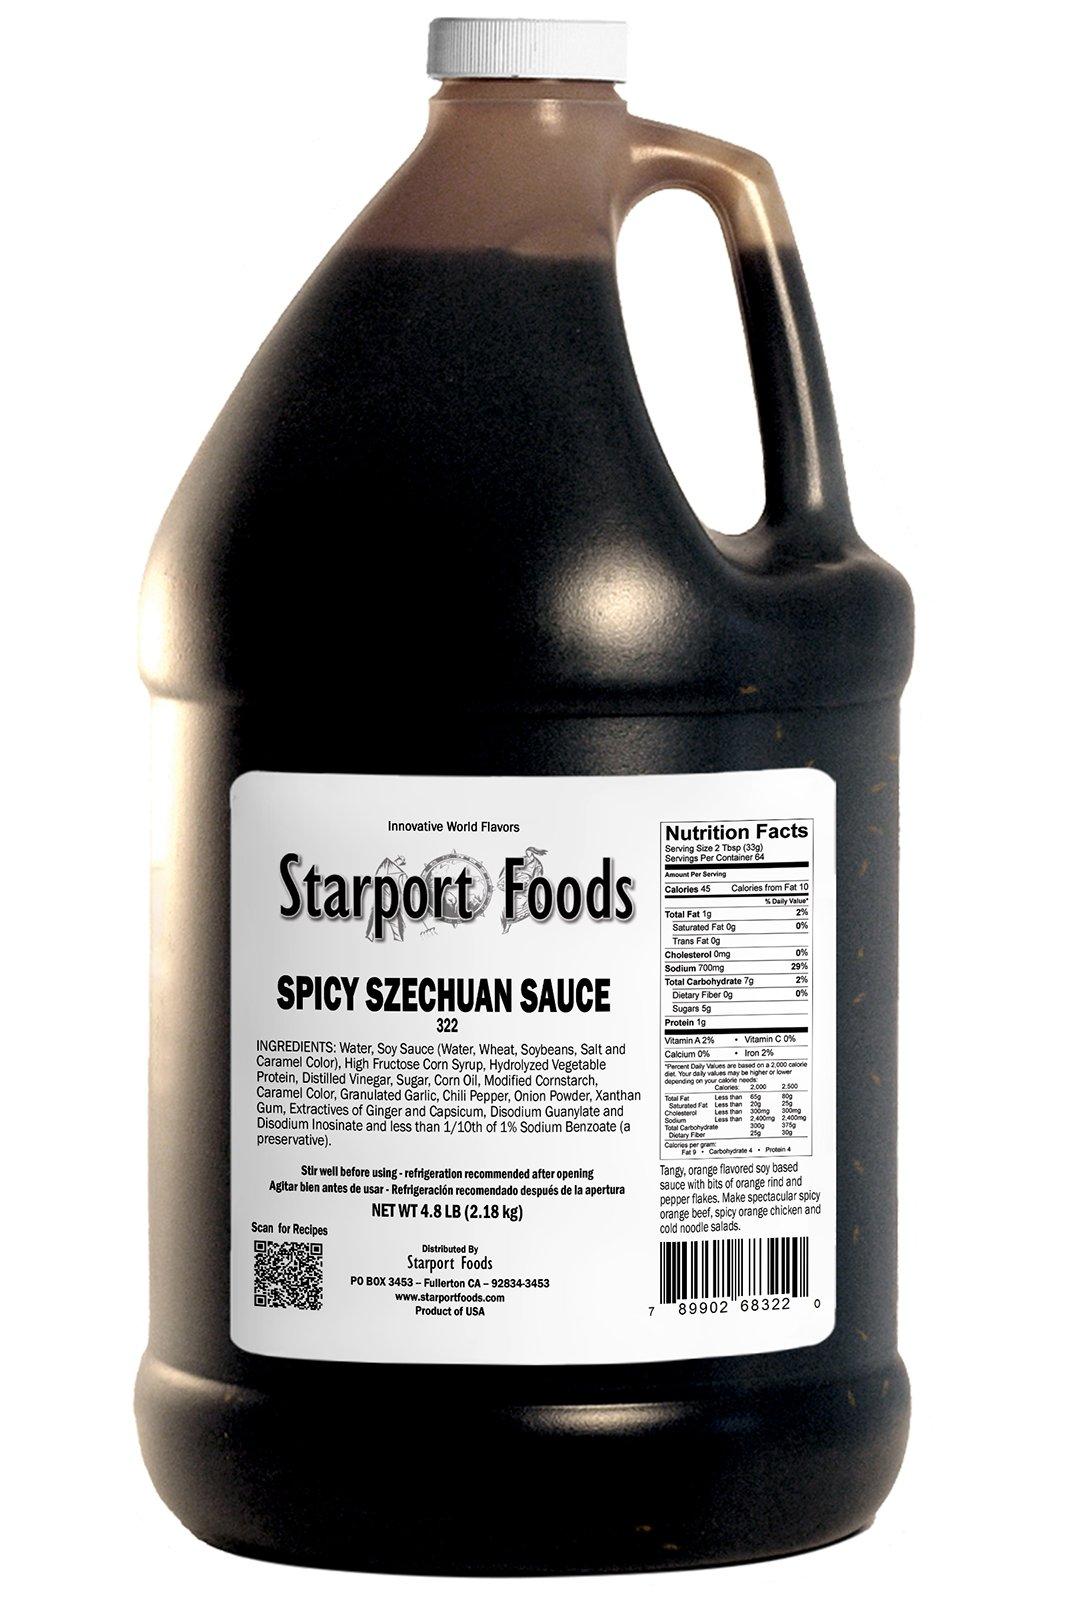 Starport Foods Spicy Szechuan Sauce, 64oz jug, Net Wt 4.8lb